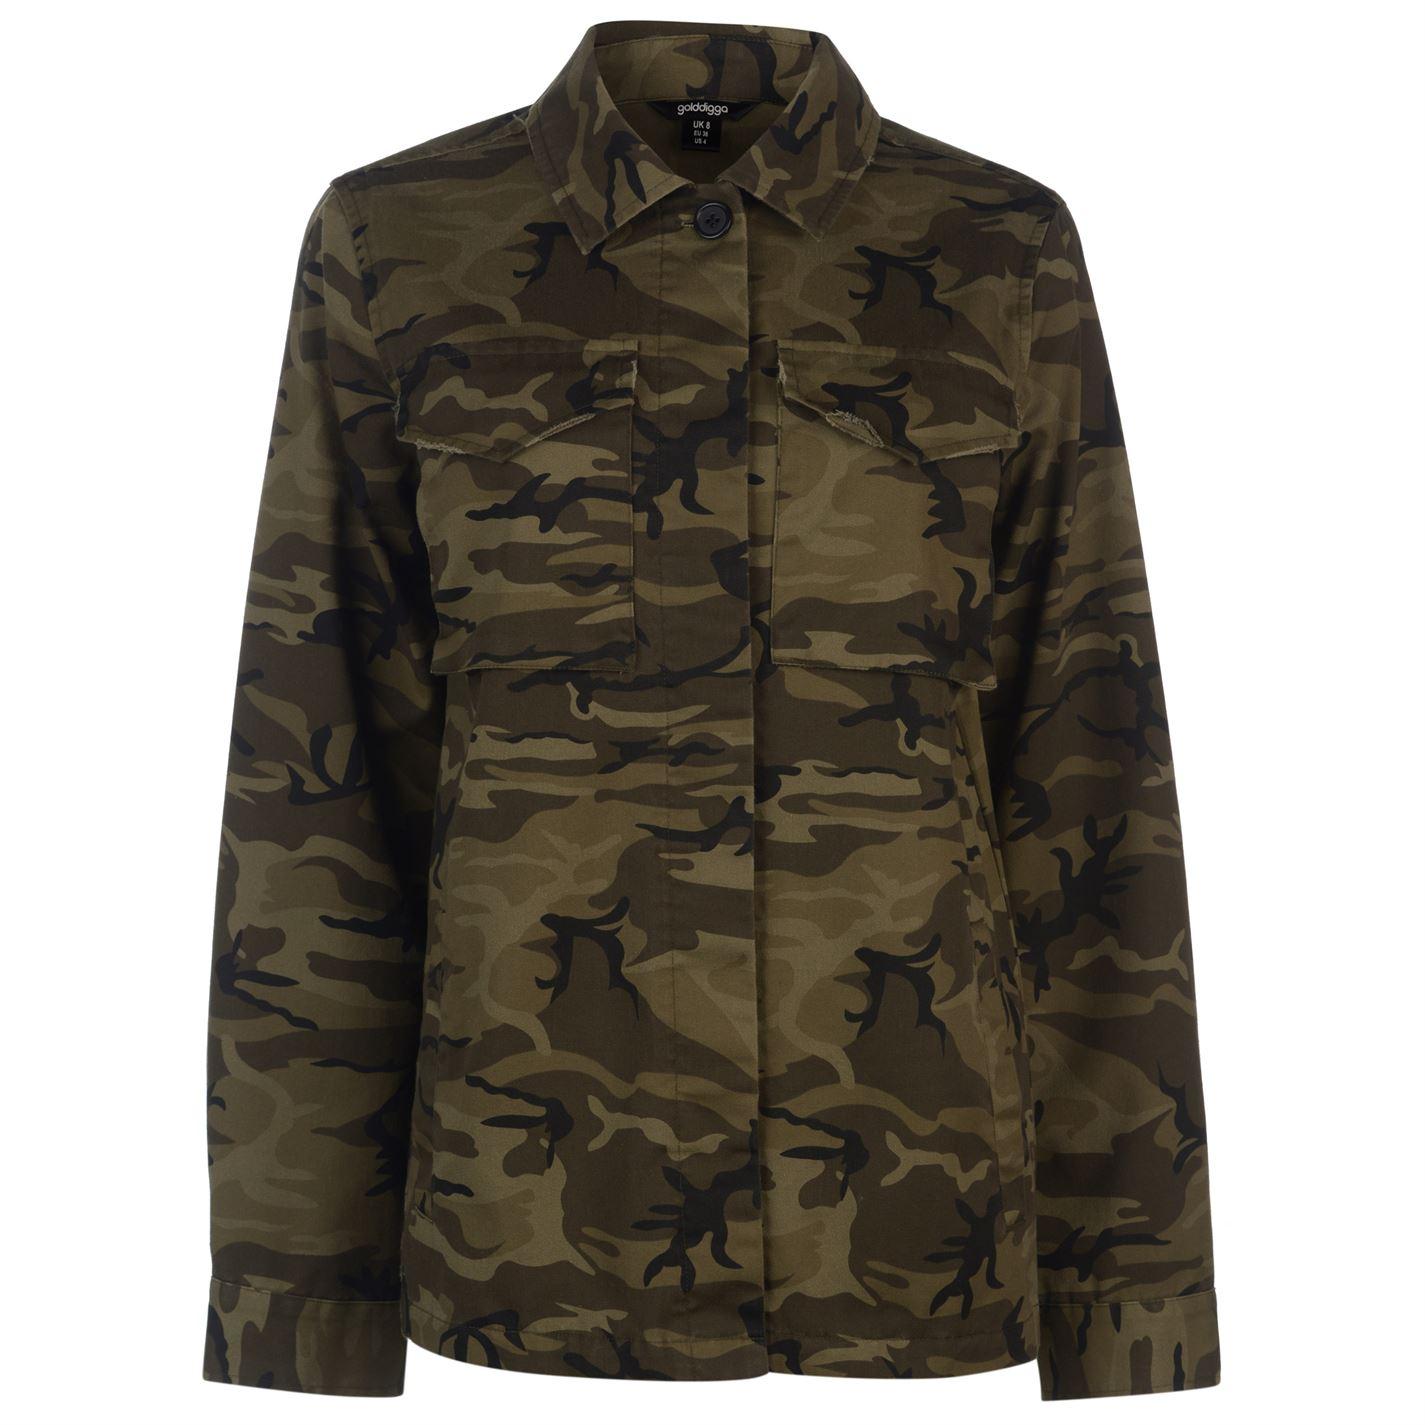 992eb8478 Golddigga military jacket ladies levně | Blesk zboží